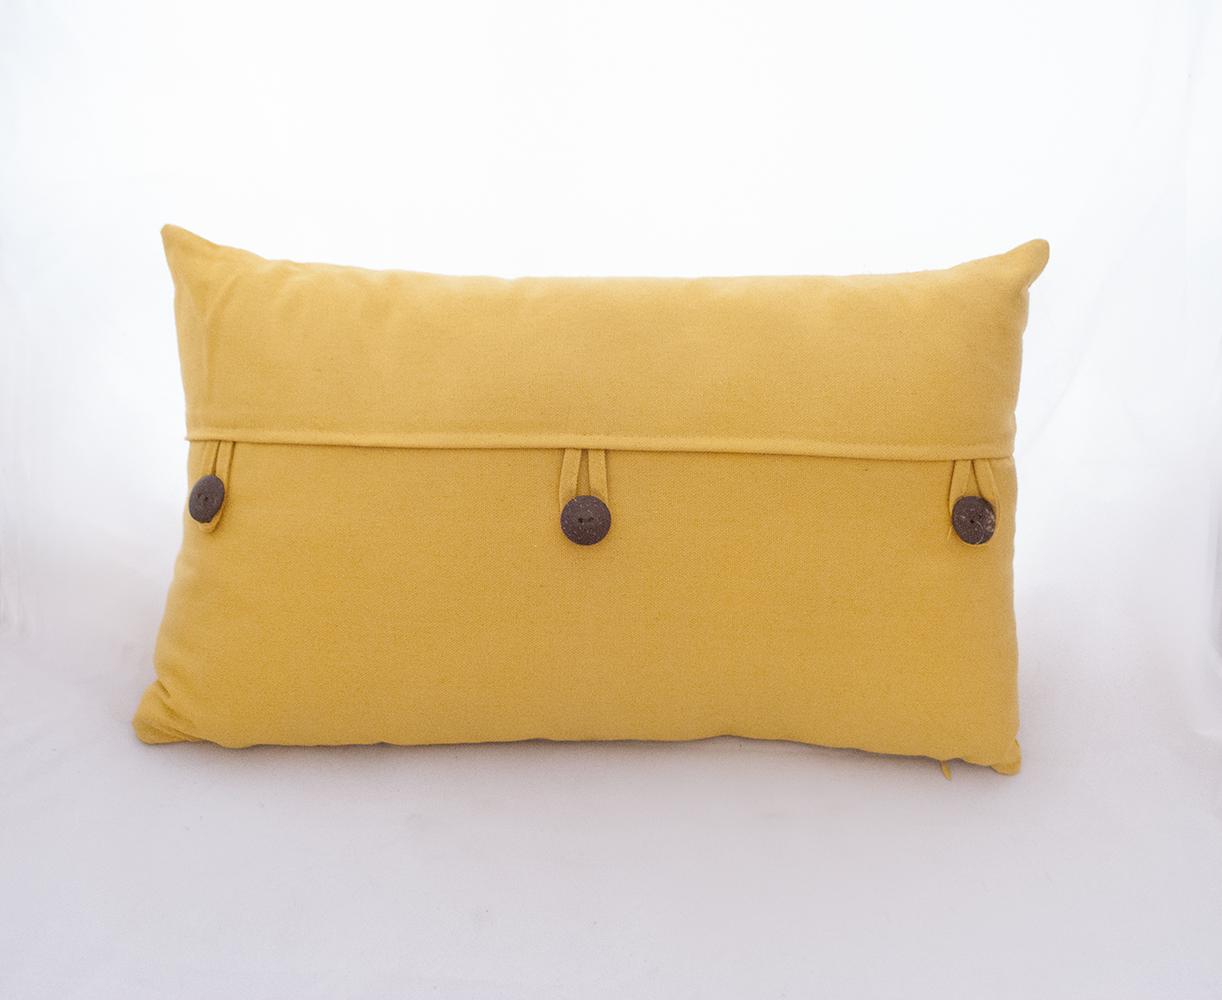 yellow button pillow   Quantity: 2  Price: $10.00